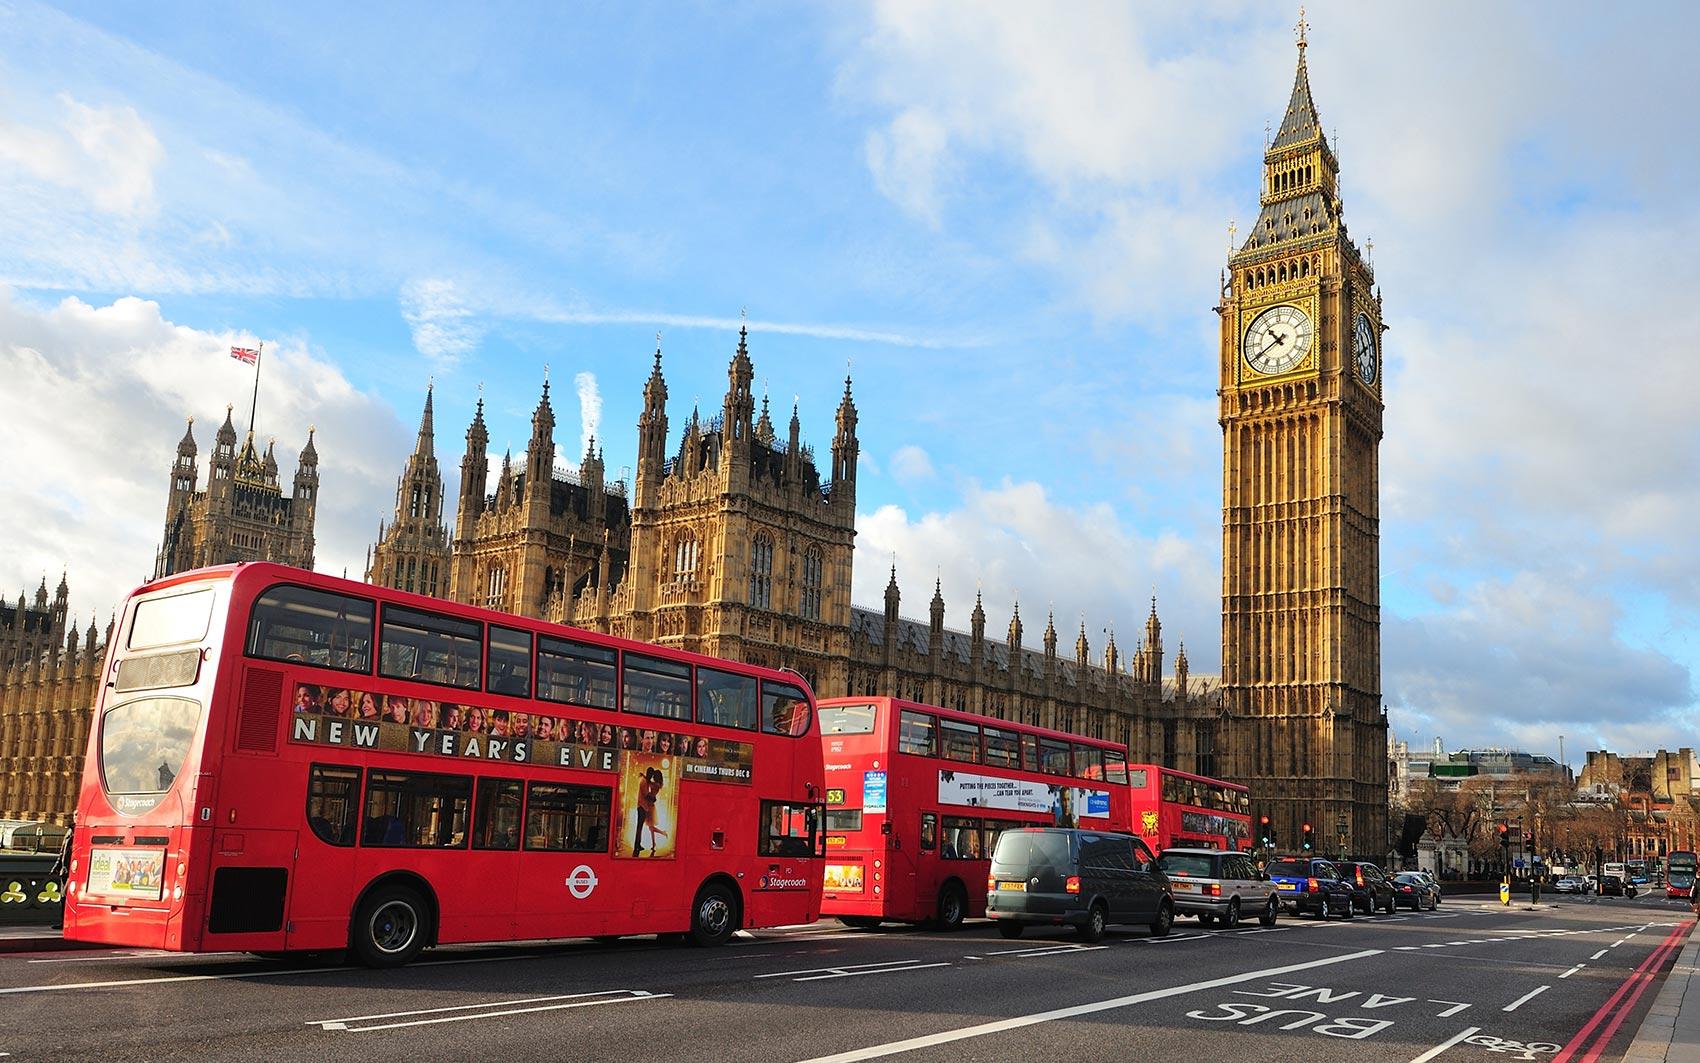 AGEORGATOS_LONDON_5